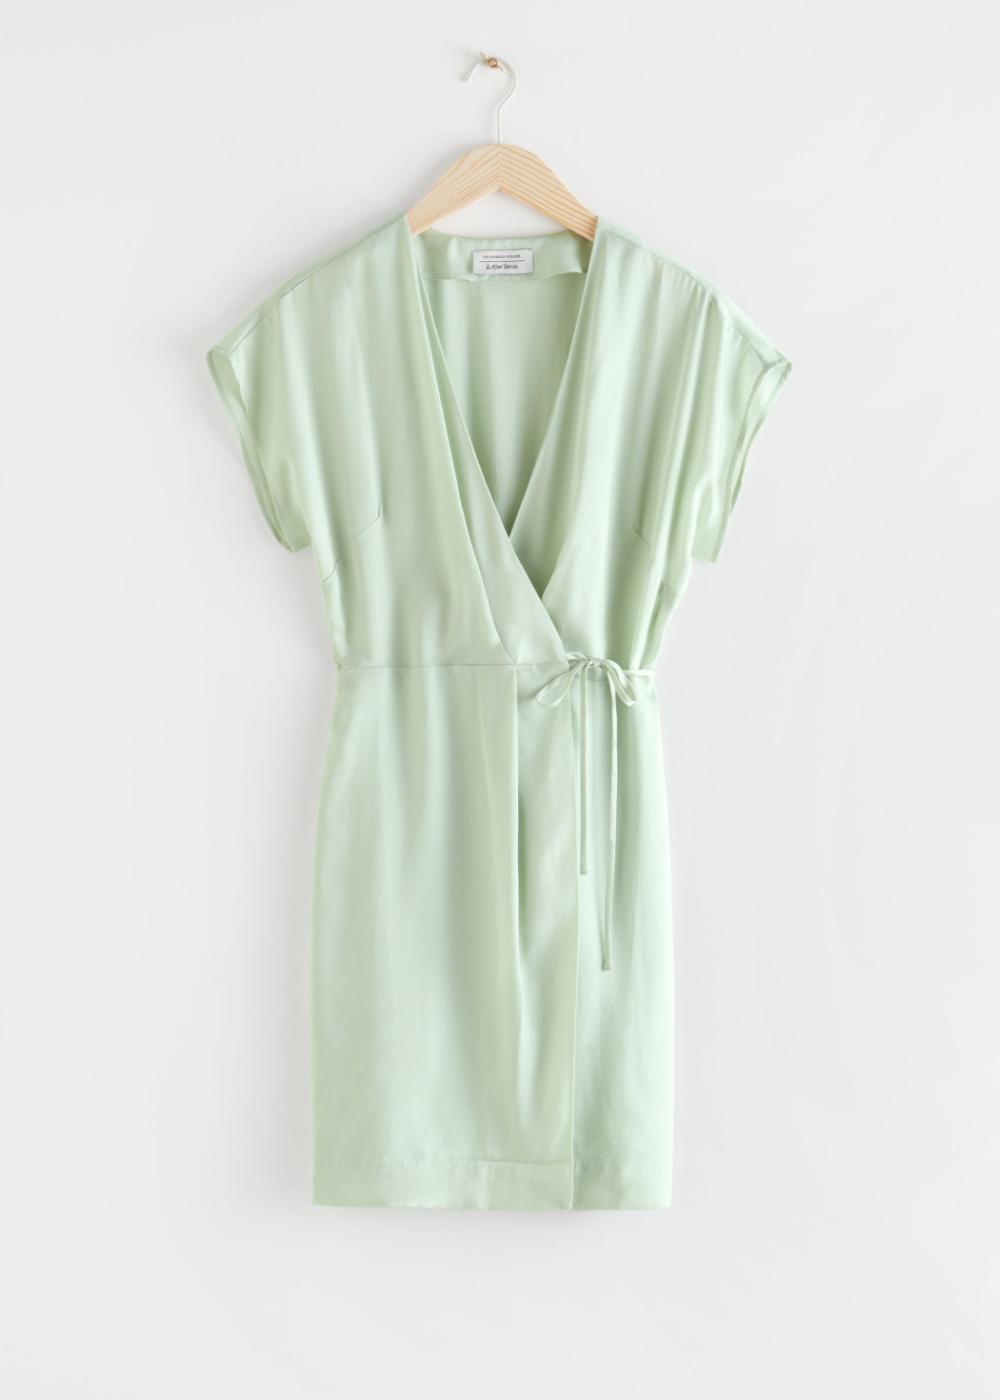 Sleeveless Wrap Dress Light Green Mini Dresses Other Stories In 2020 Sleeveless Wrap Dress Wrap Dress Green Mini Dress